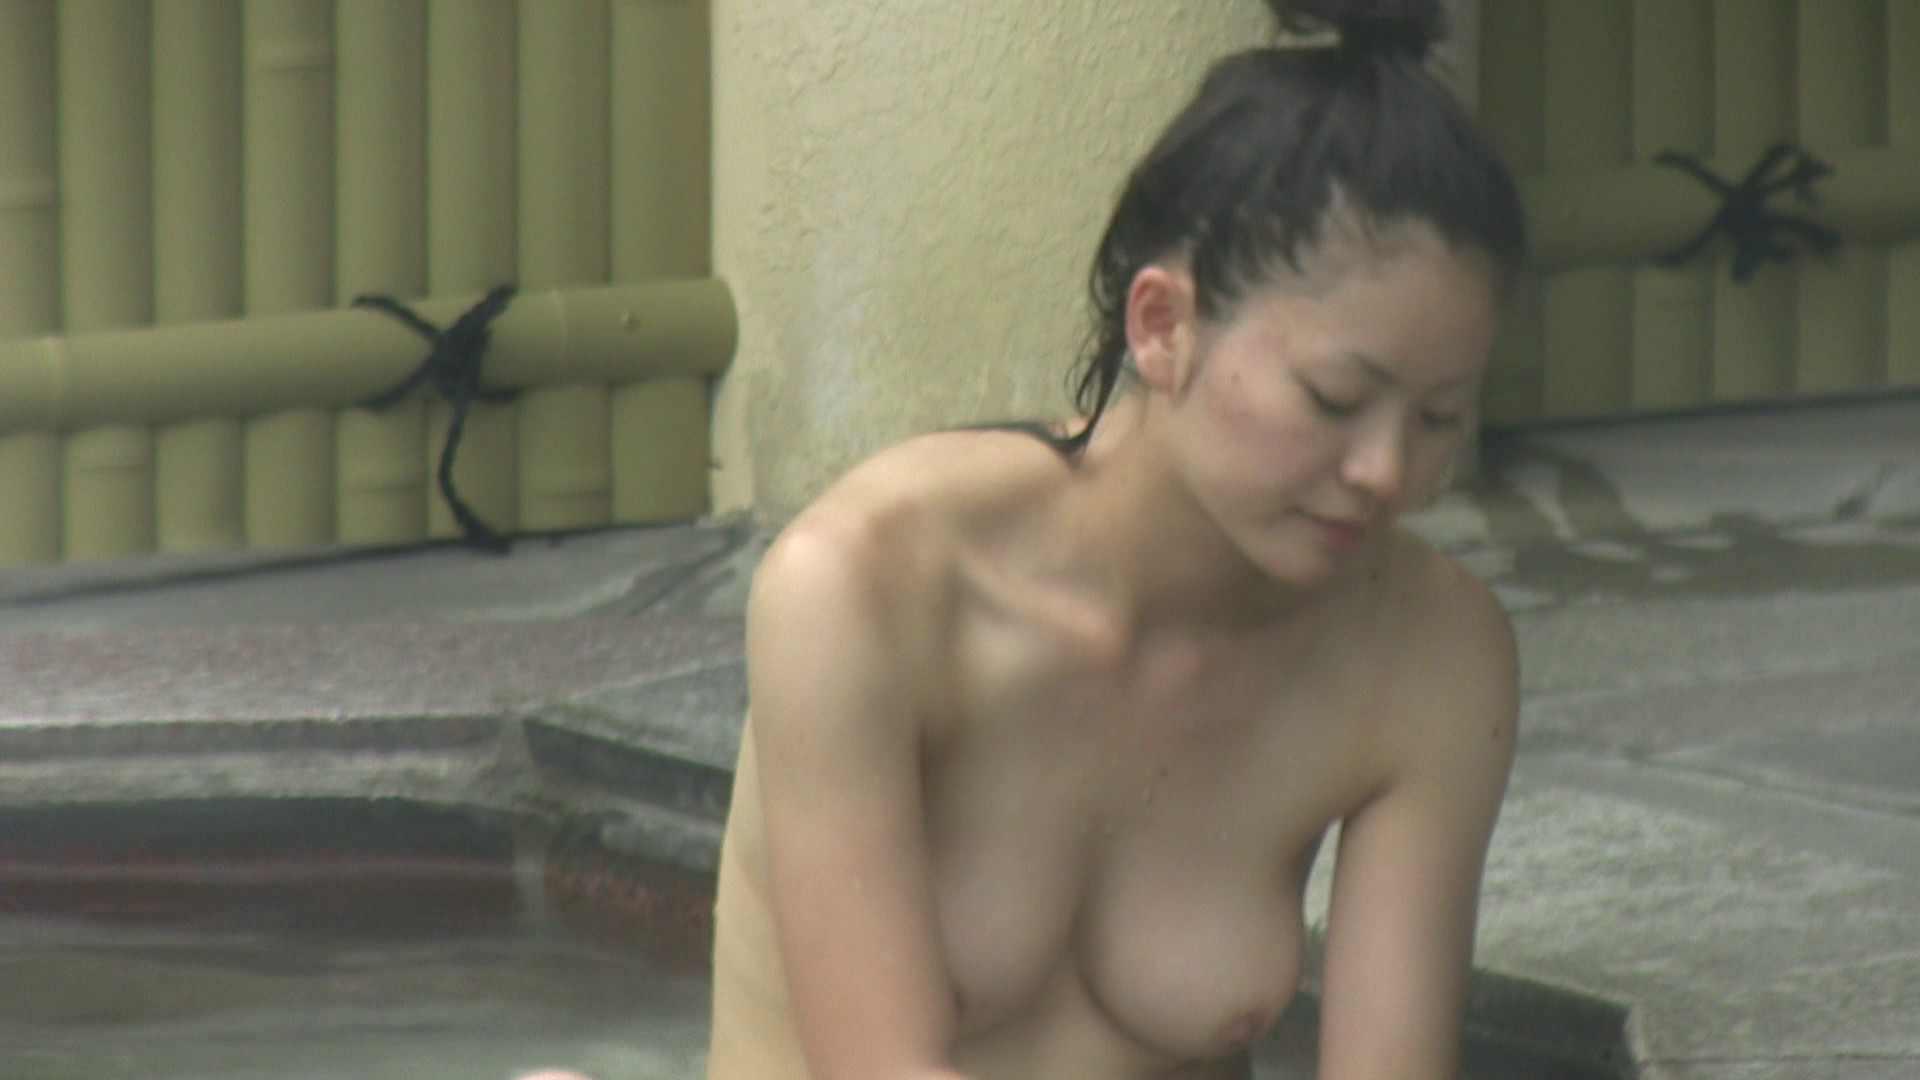 Aquaな露天風呂Vol.137 HなOL ヌード画像 92pic 46